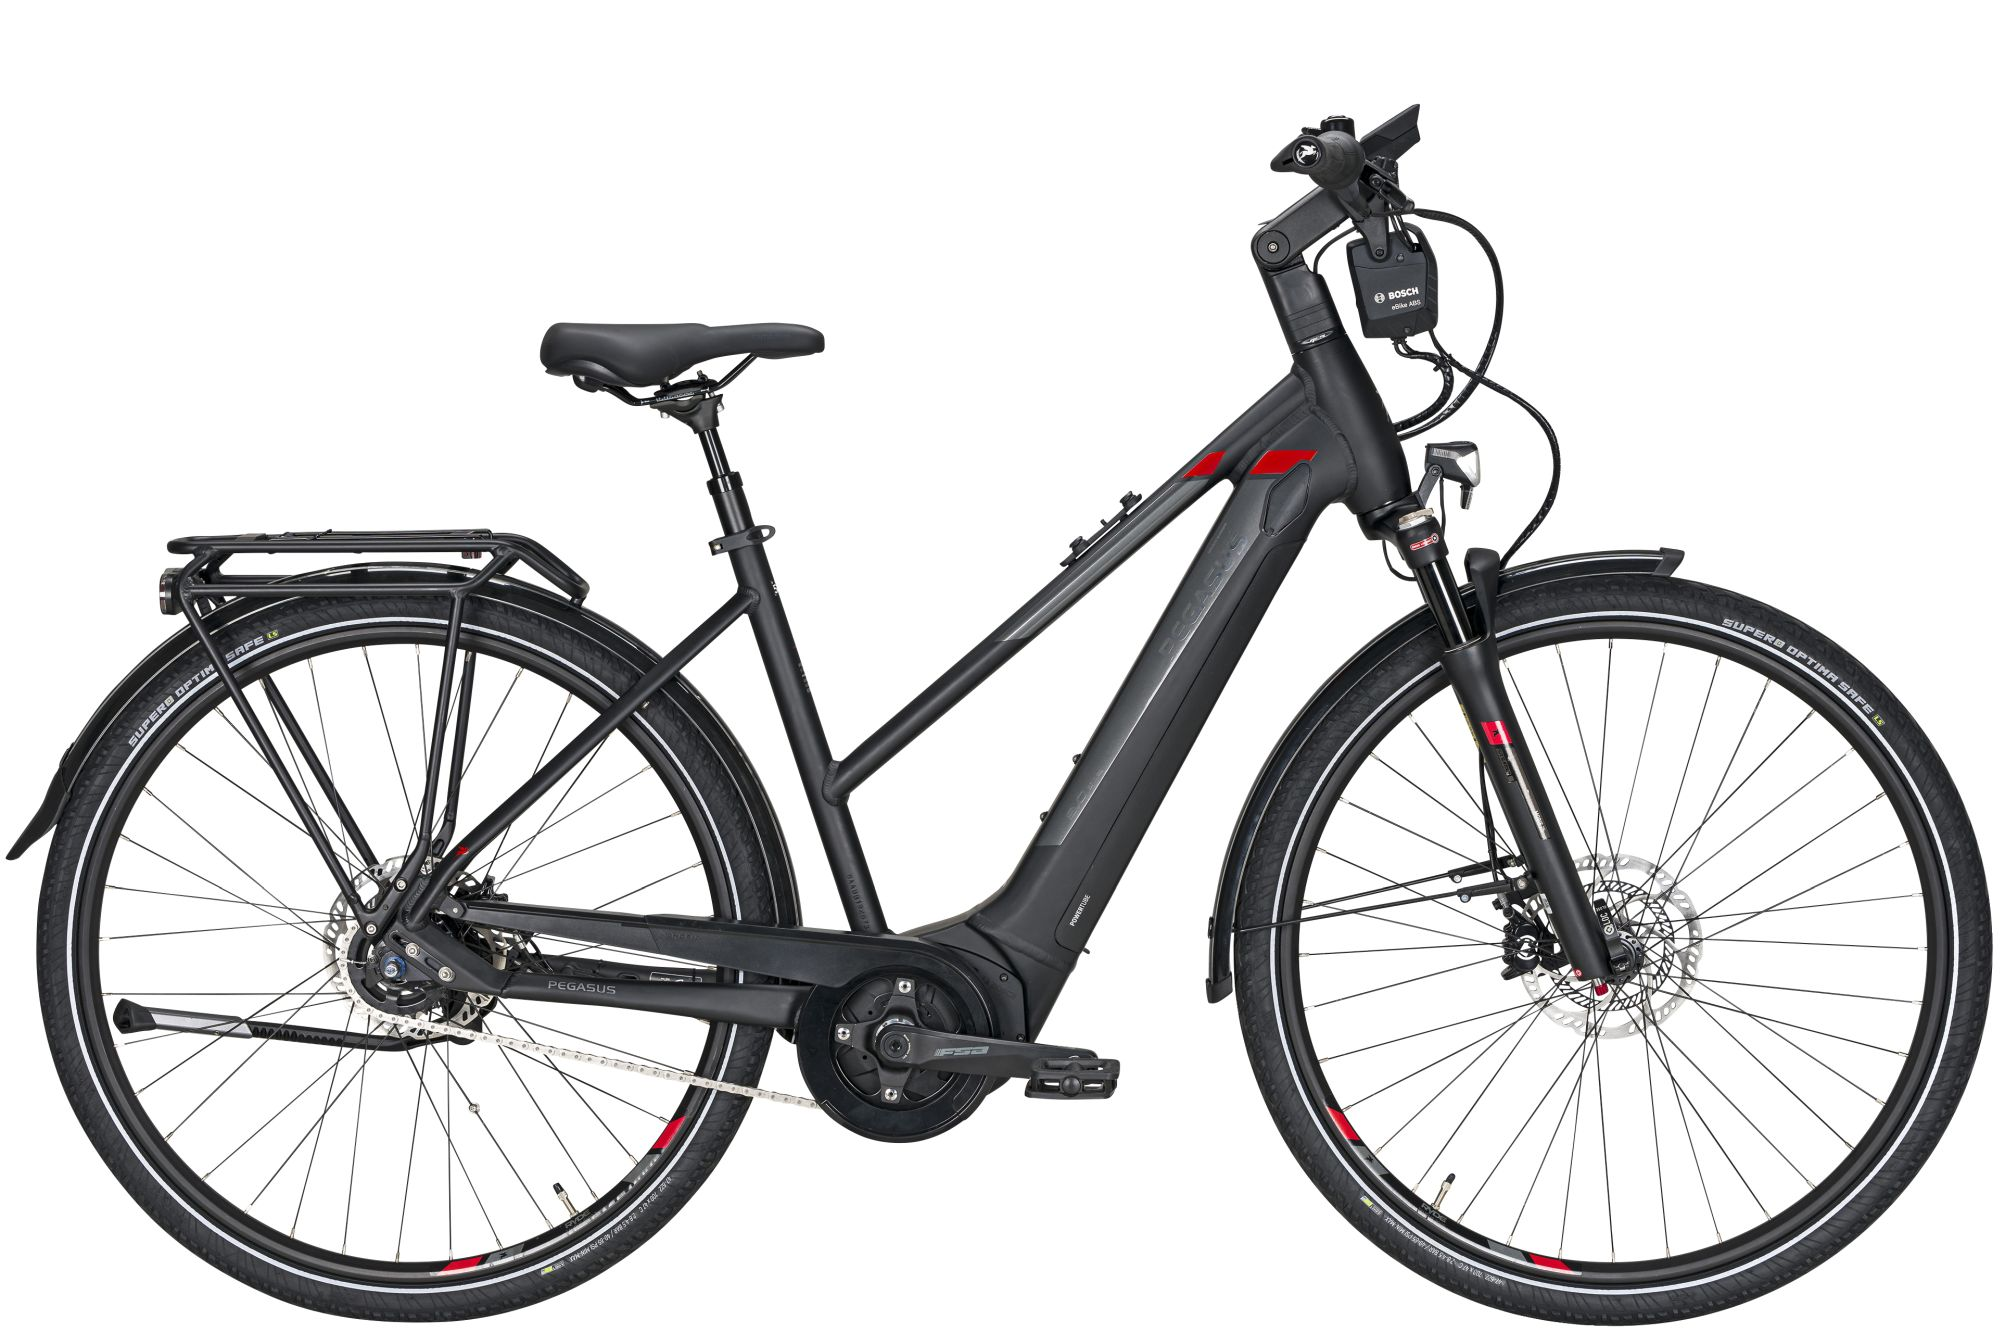 E-Bikes: Pegasus  Premio Evo 5F ABS (625 Wh) 5 Gang Nabenschaltung Damenfahrrad Trapez Modell 2021 28 Zoll 45 cm